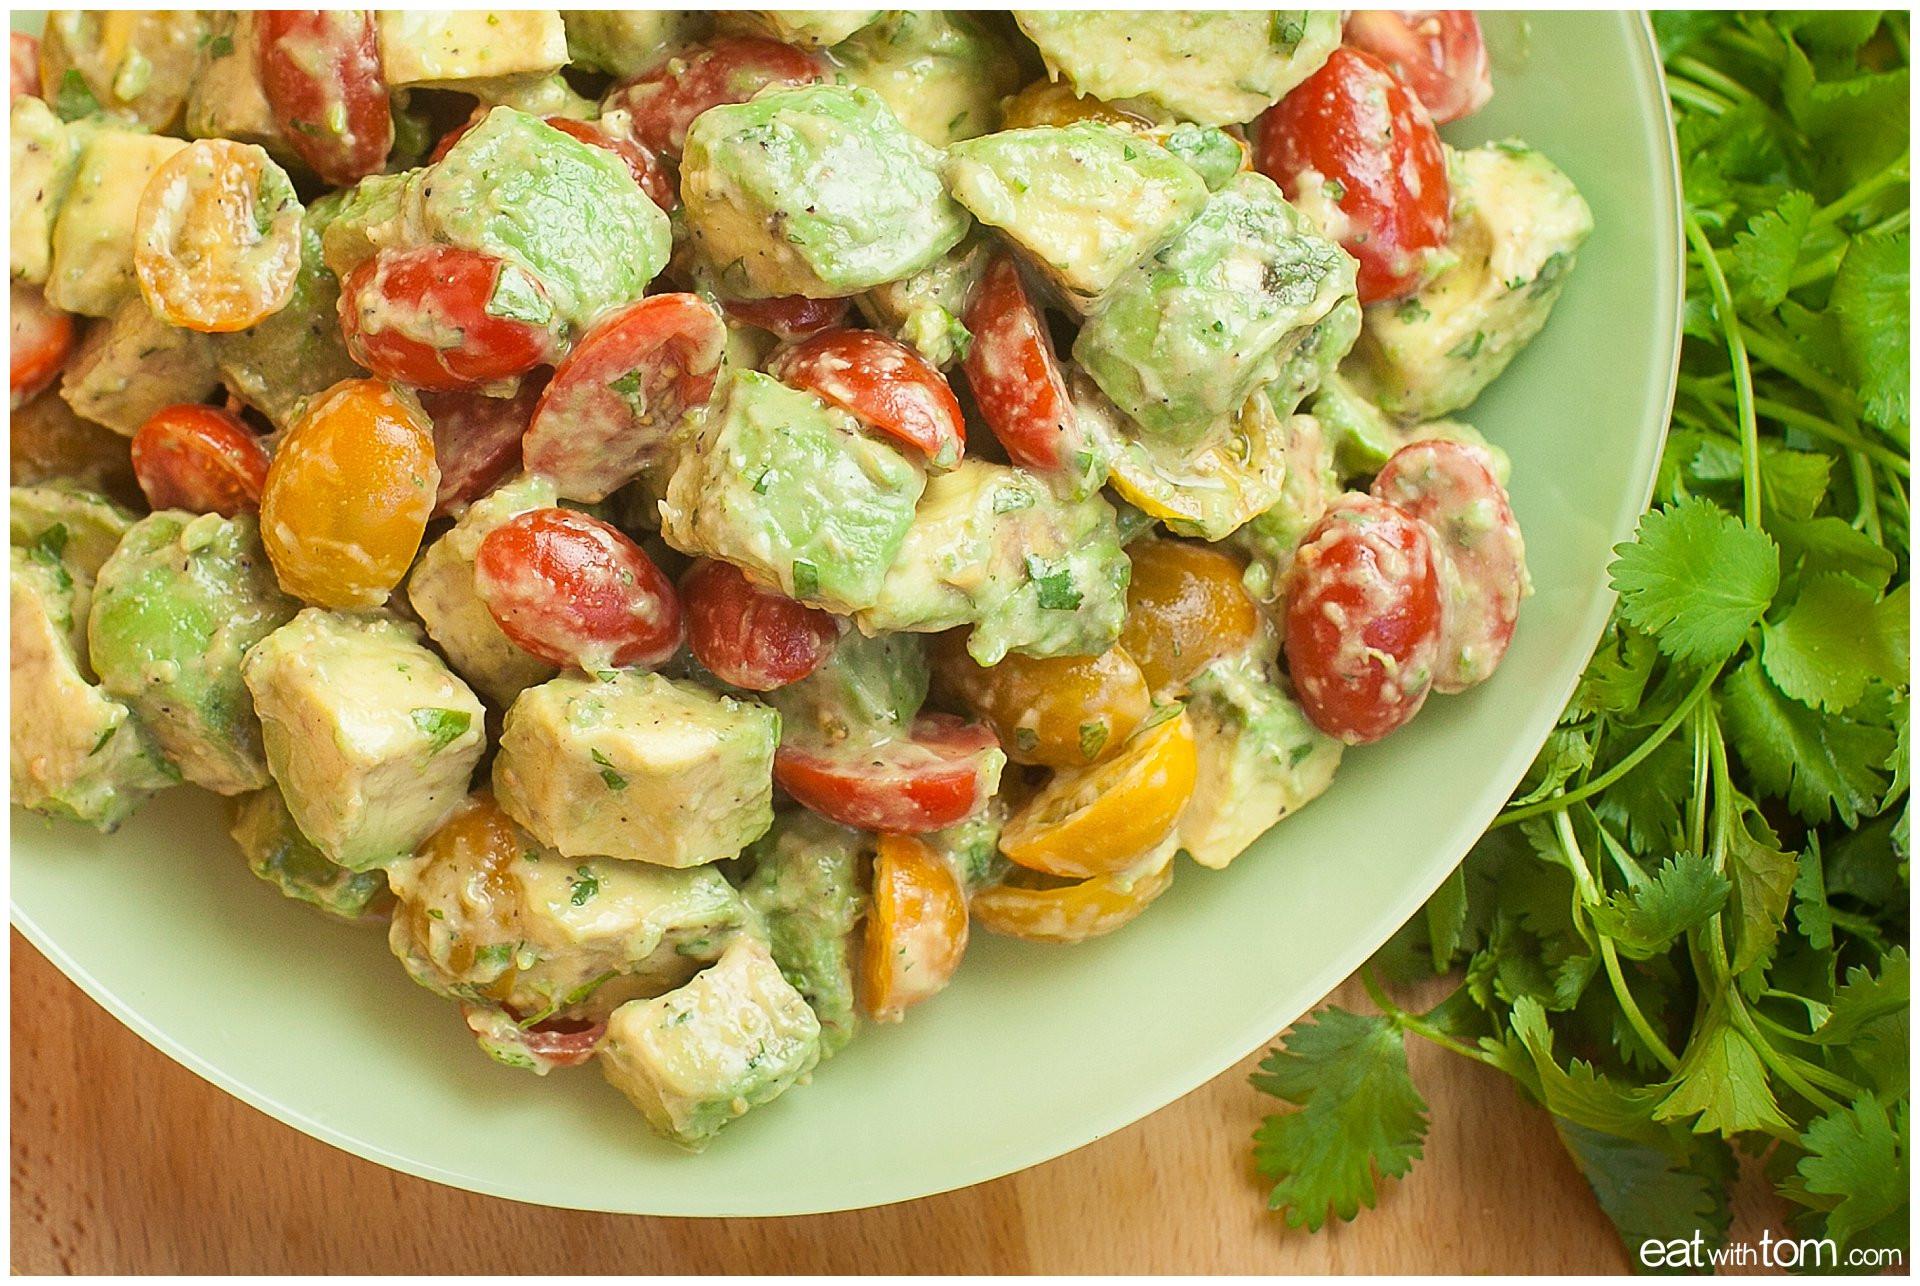 Healthy Guacamole Meals  Limey Avocado Salad Recipe w Grape Tomatoes Eat with Tom